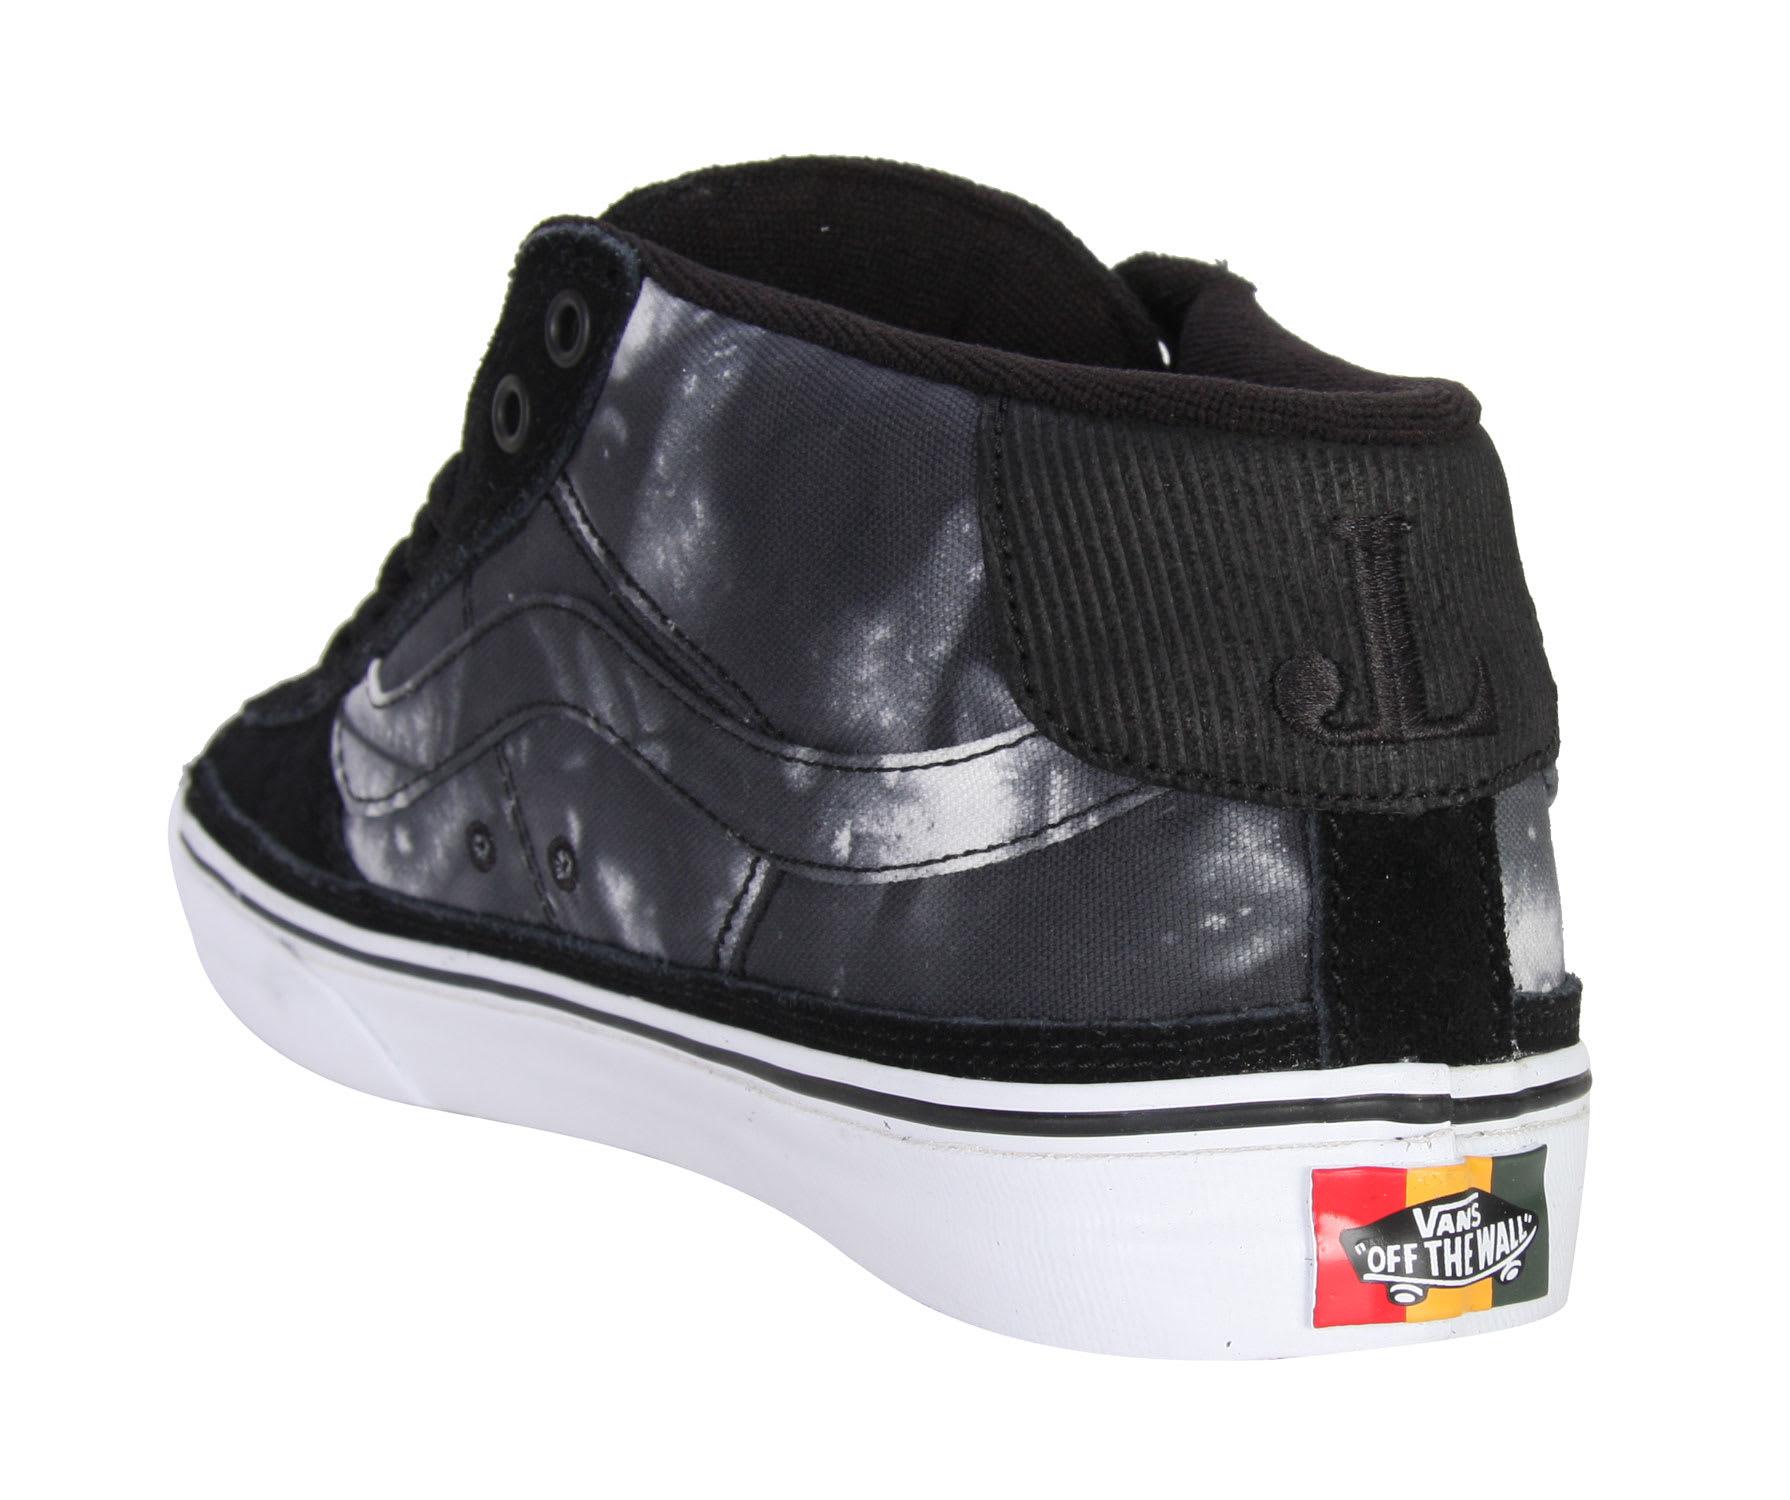 71bf38f1406178 Vans J Lay Mid Skate Shoes - thumbnail 2